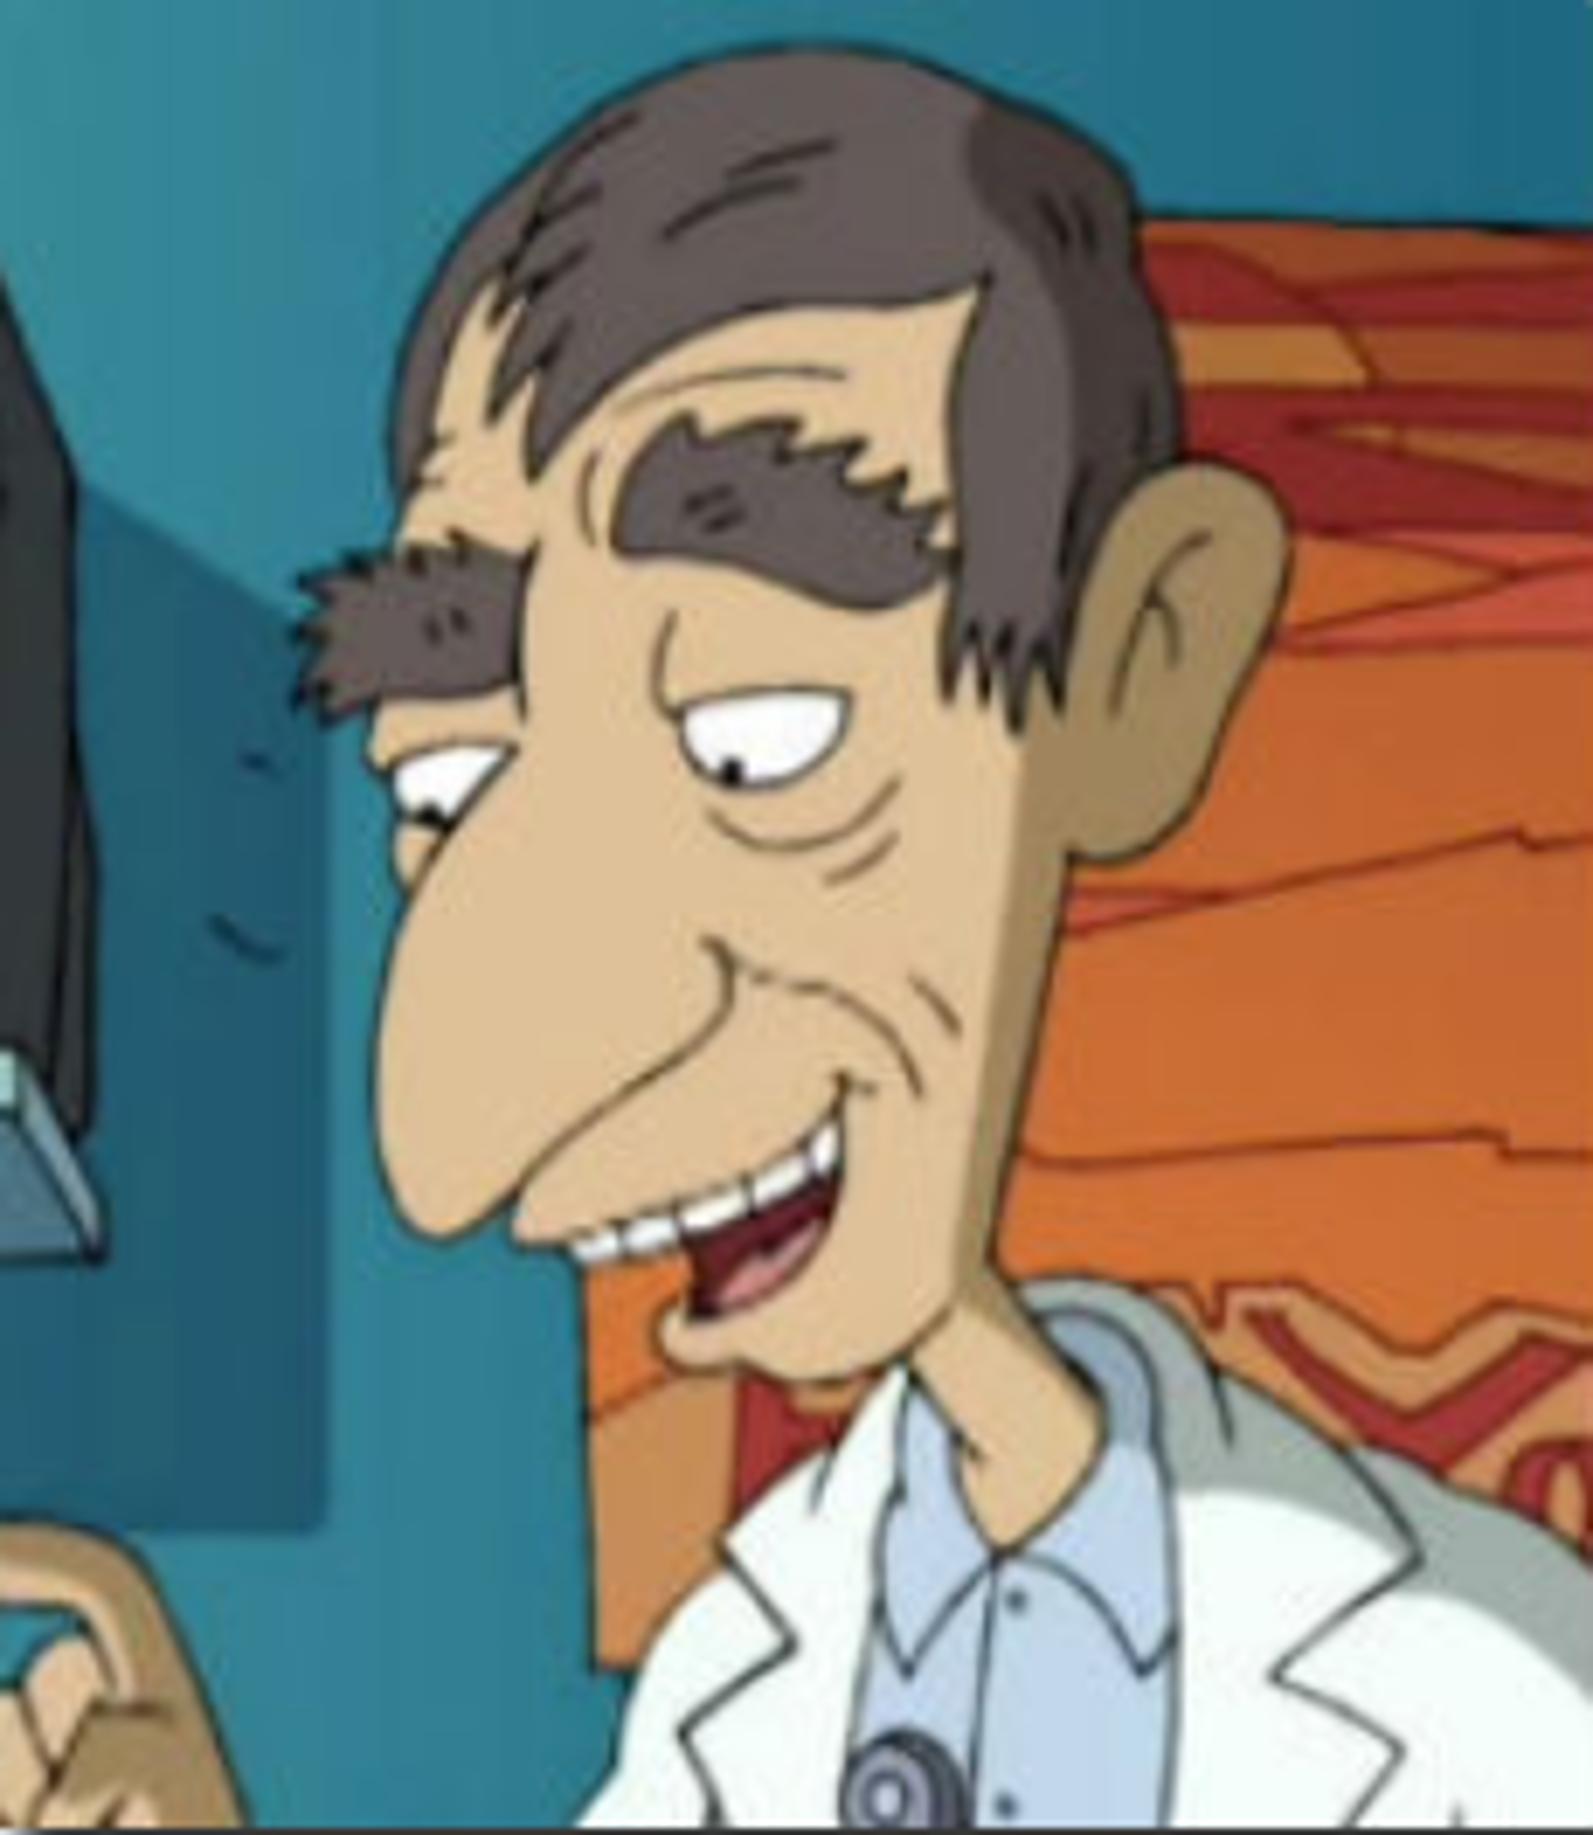 Dr. Schleprizzi